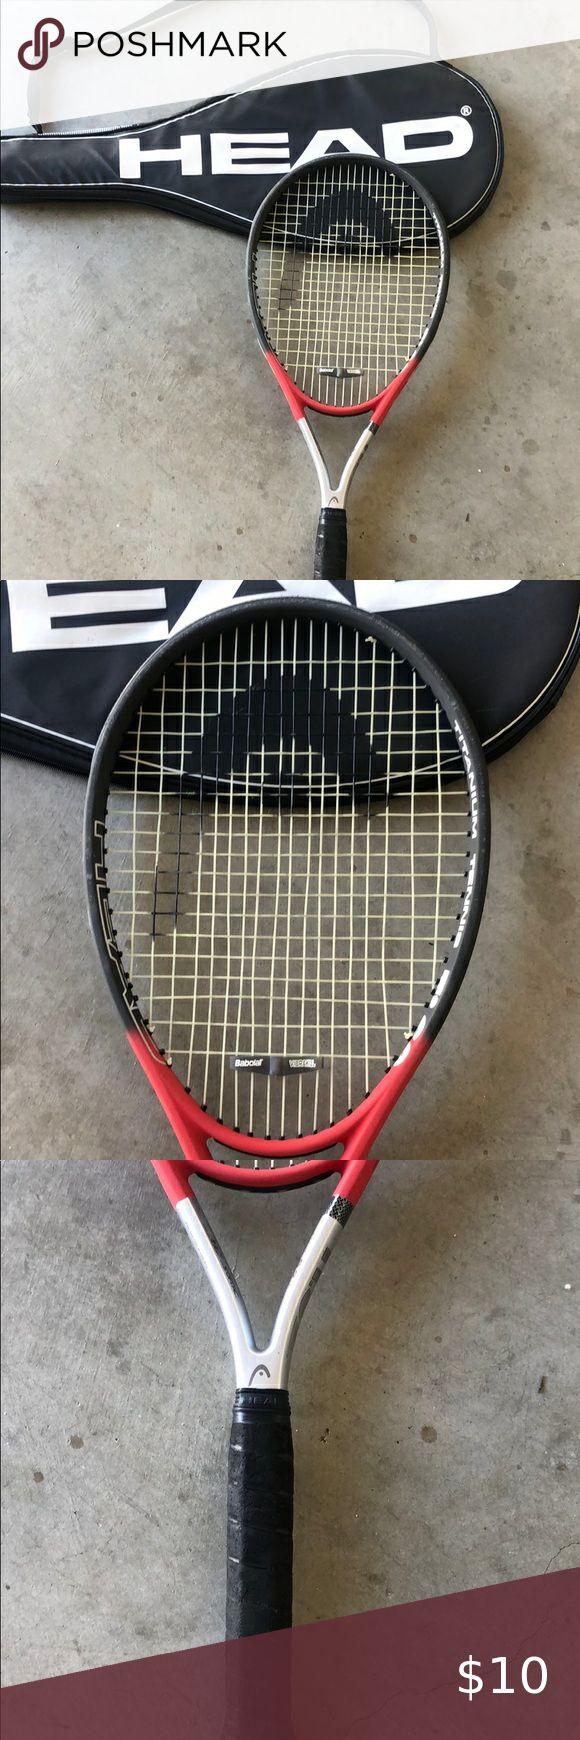 HEAD tennis racket   Head tennis racket, Head tennis